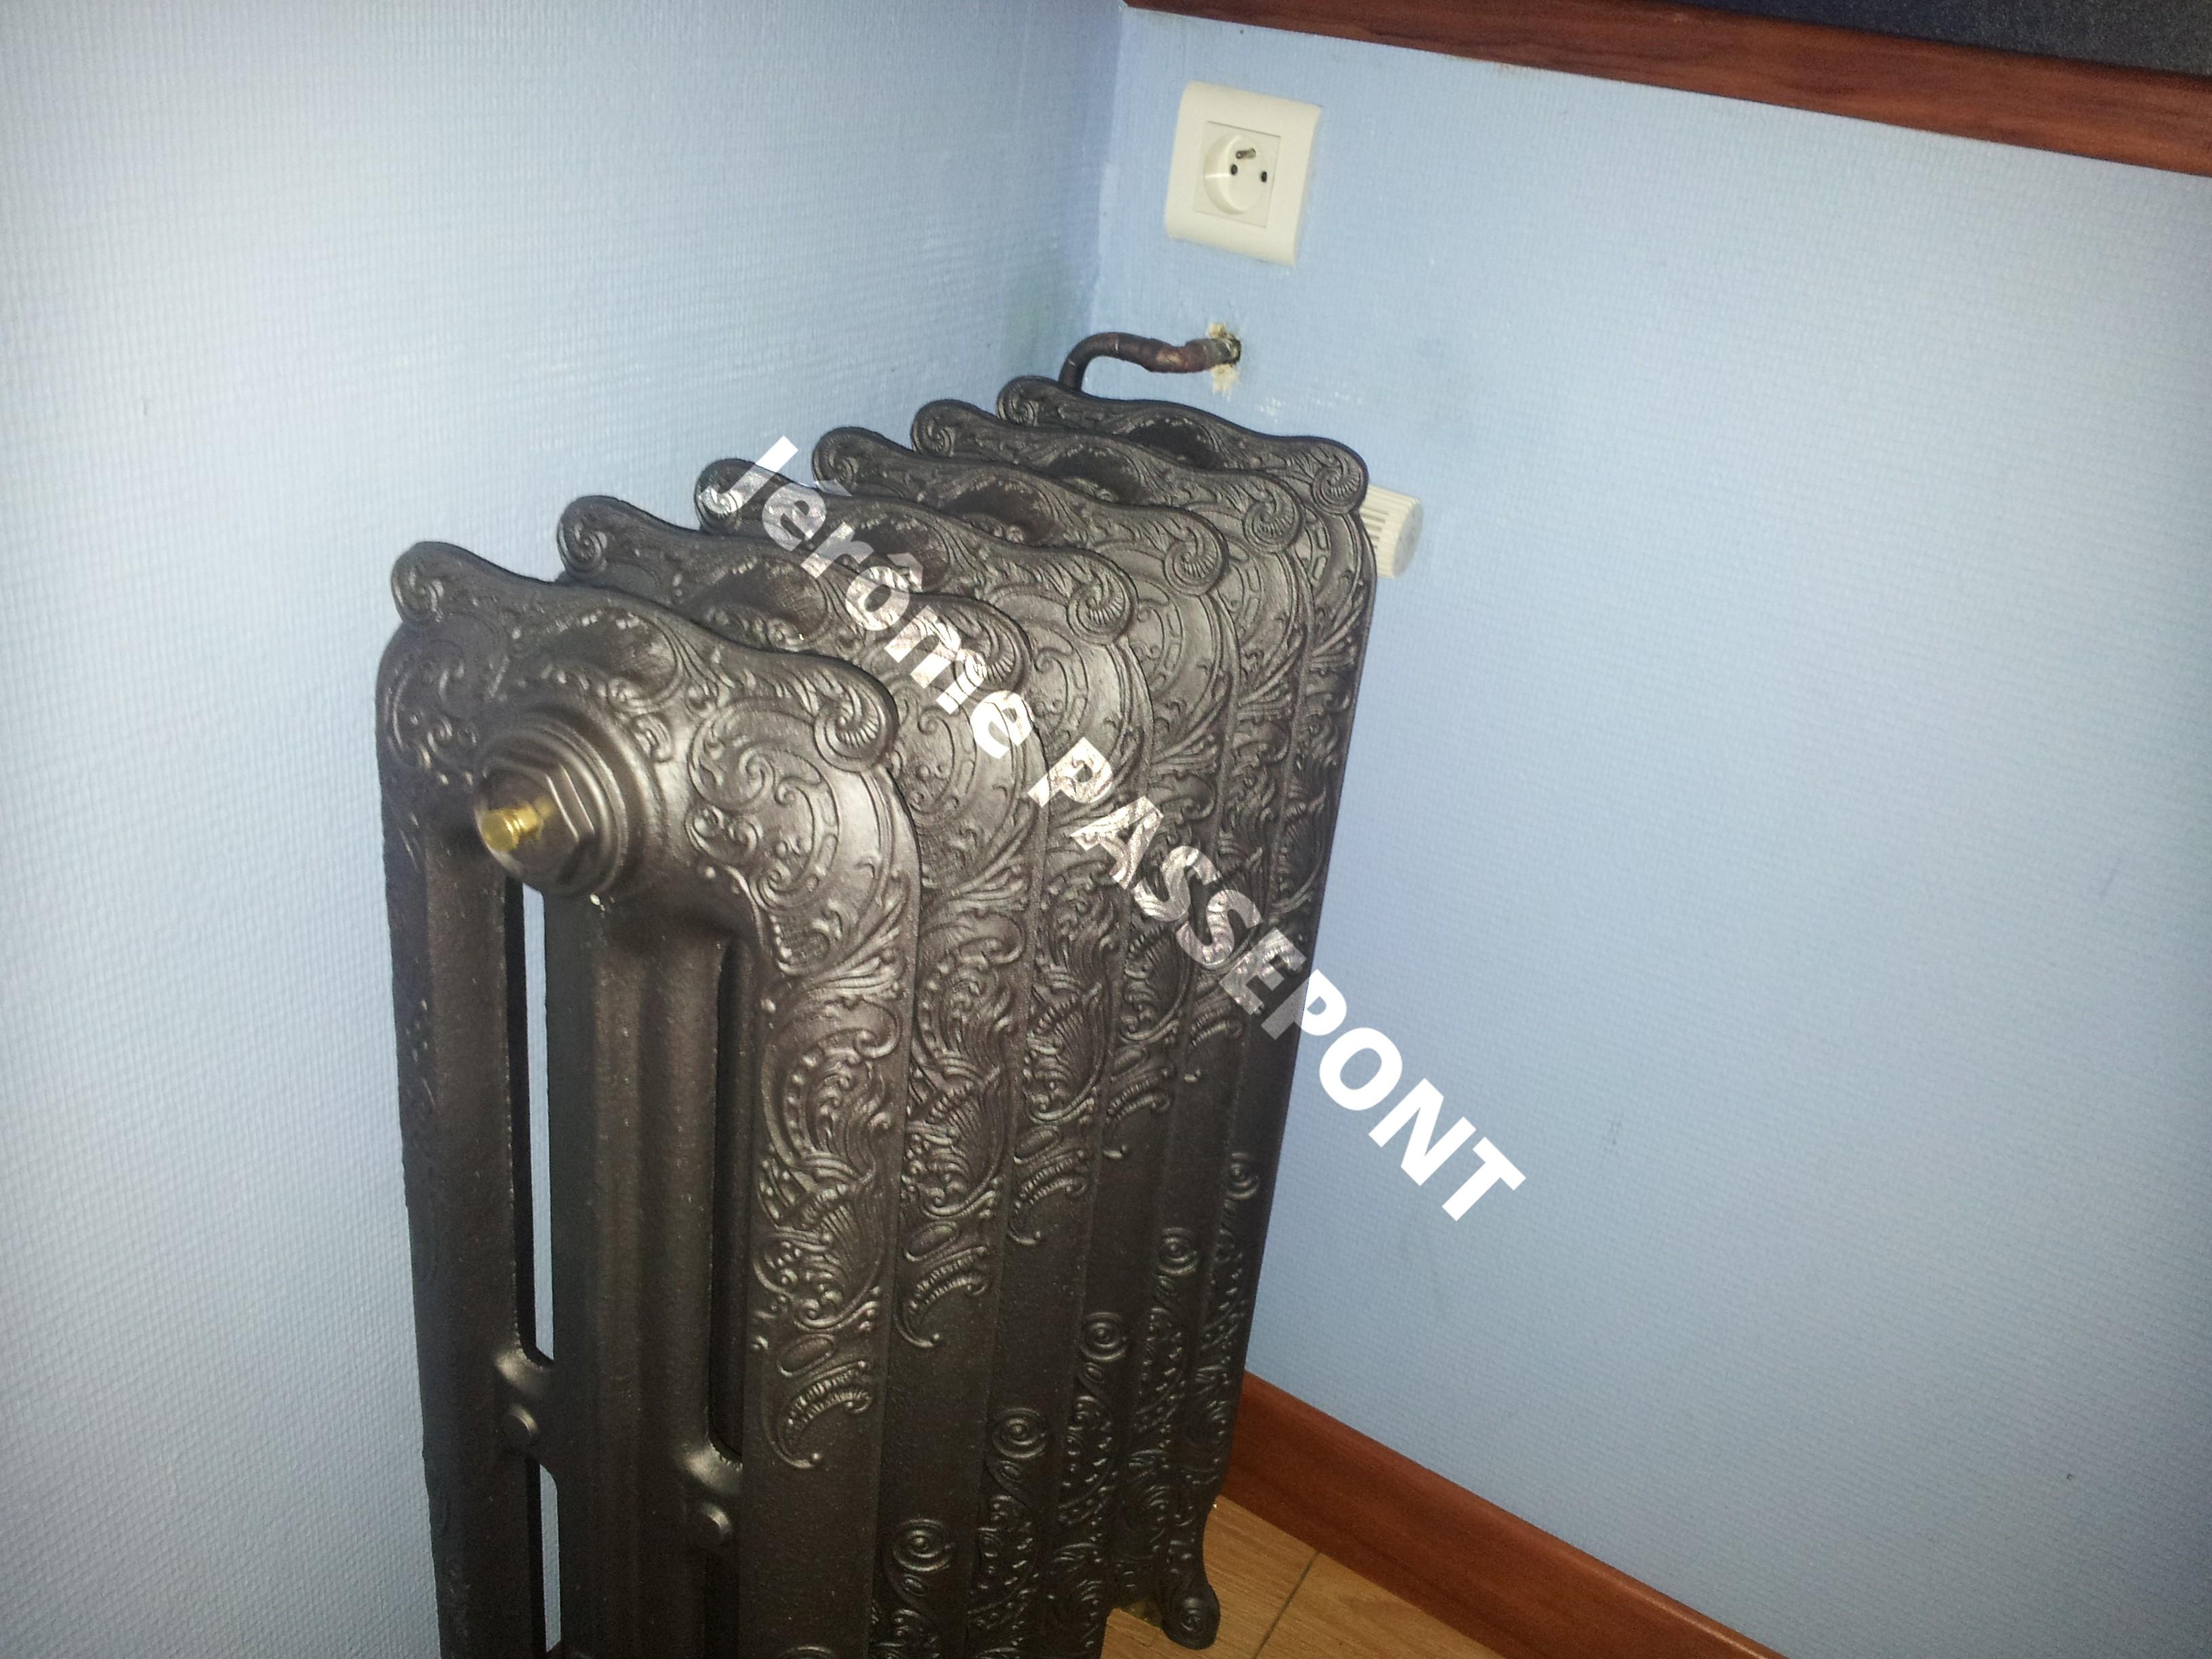 plomberie chauffage vmc couverture zinguerie chauffage brioude. Black Bedroom Furniture Sets. Home Design Ideas